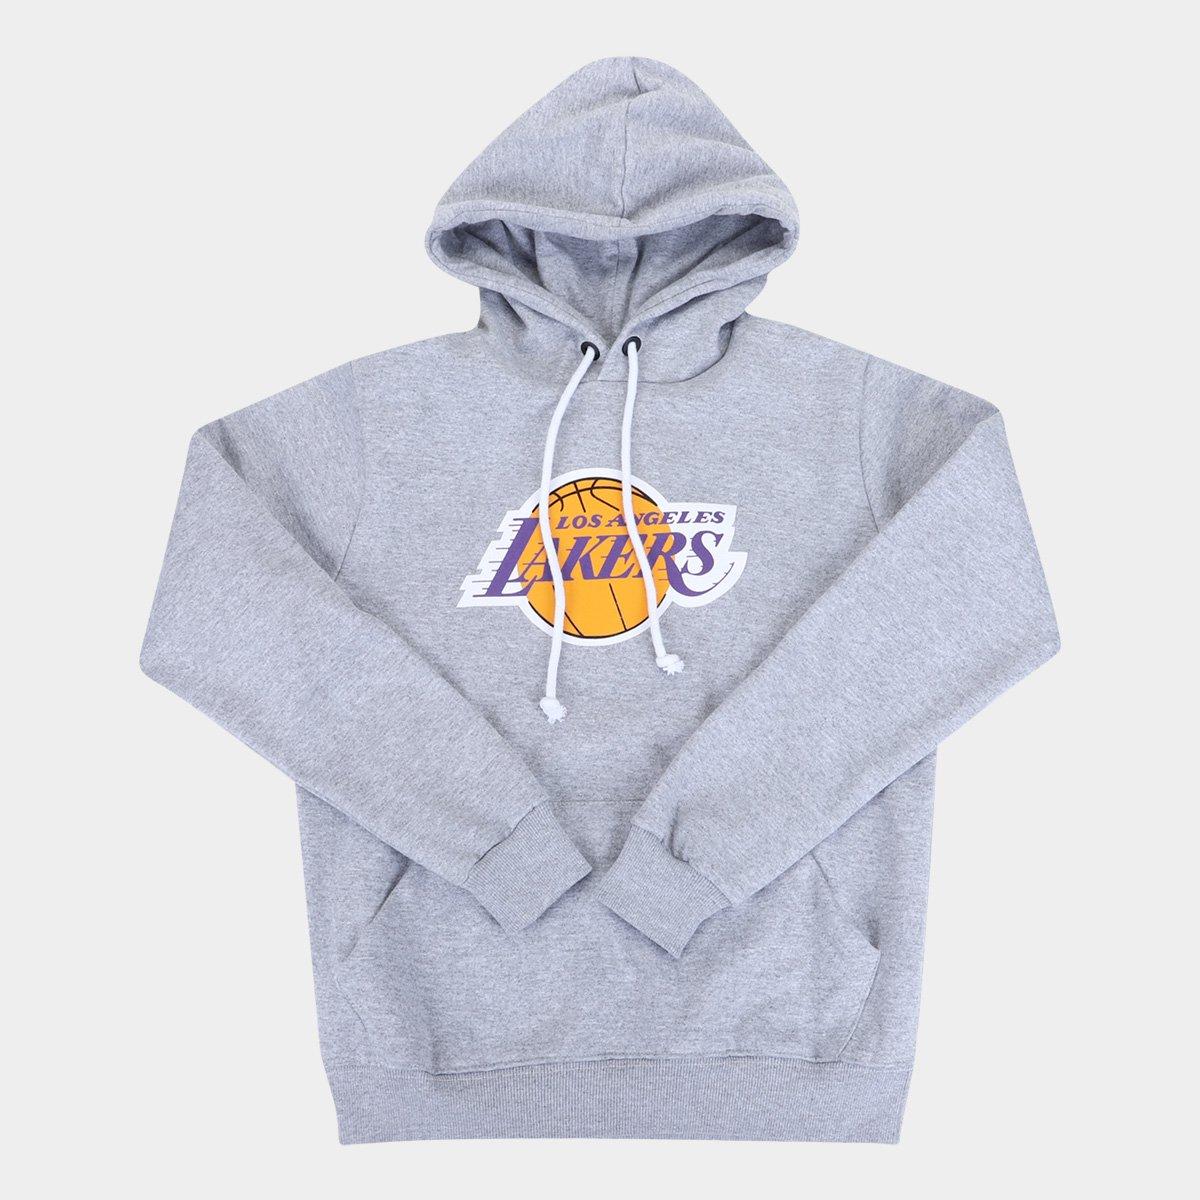 Moletom NBA Los Angeles Lakers Juvenil Canguru Masculino